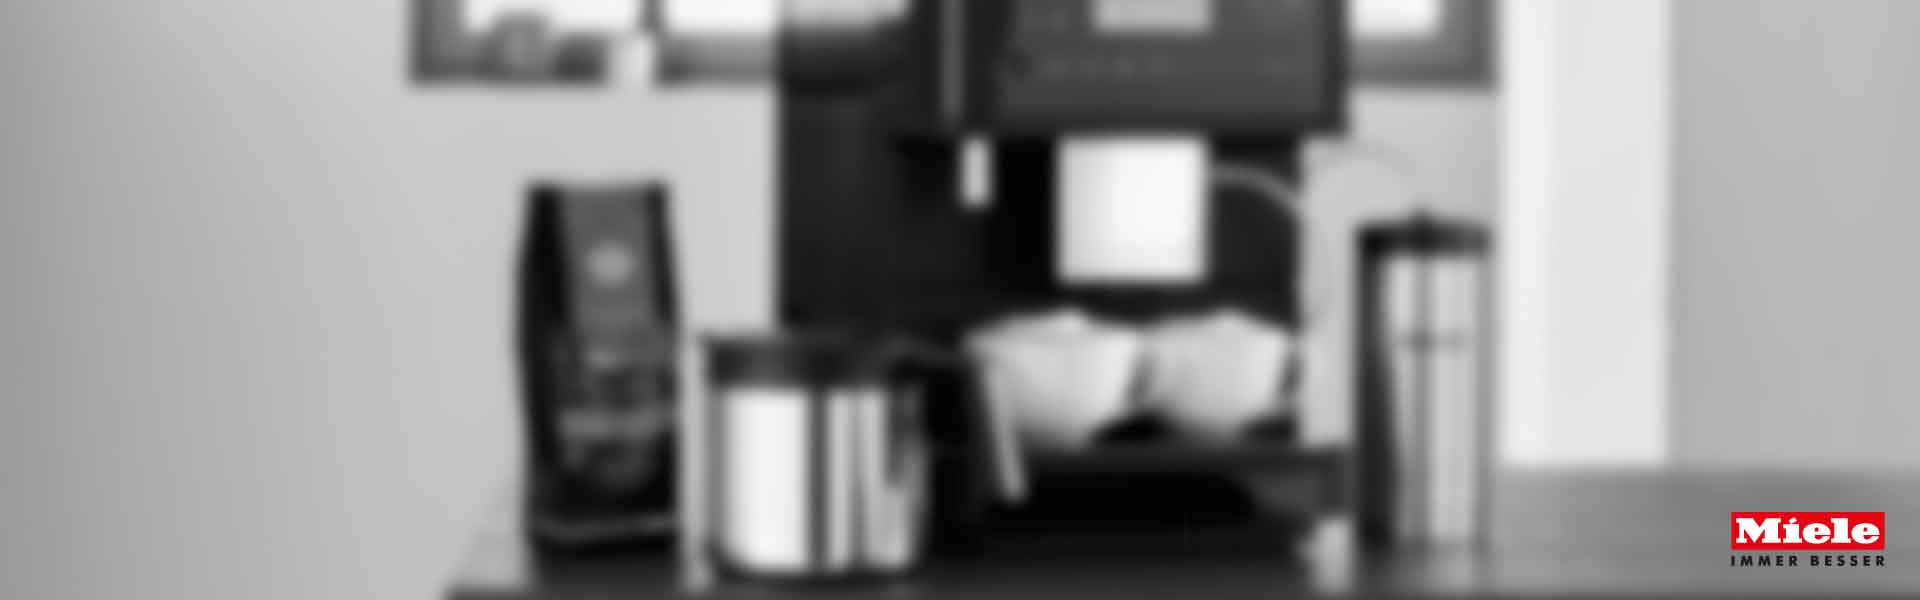 miele saugroboter scout rx2 elektroger te bei monsator hausger te dresden gmbh. Black Bedroom Furniture Sets. Home Design Ideas